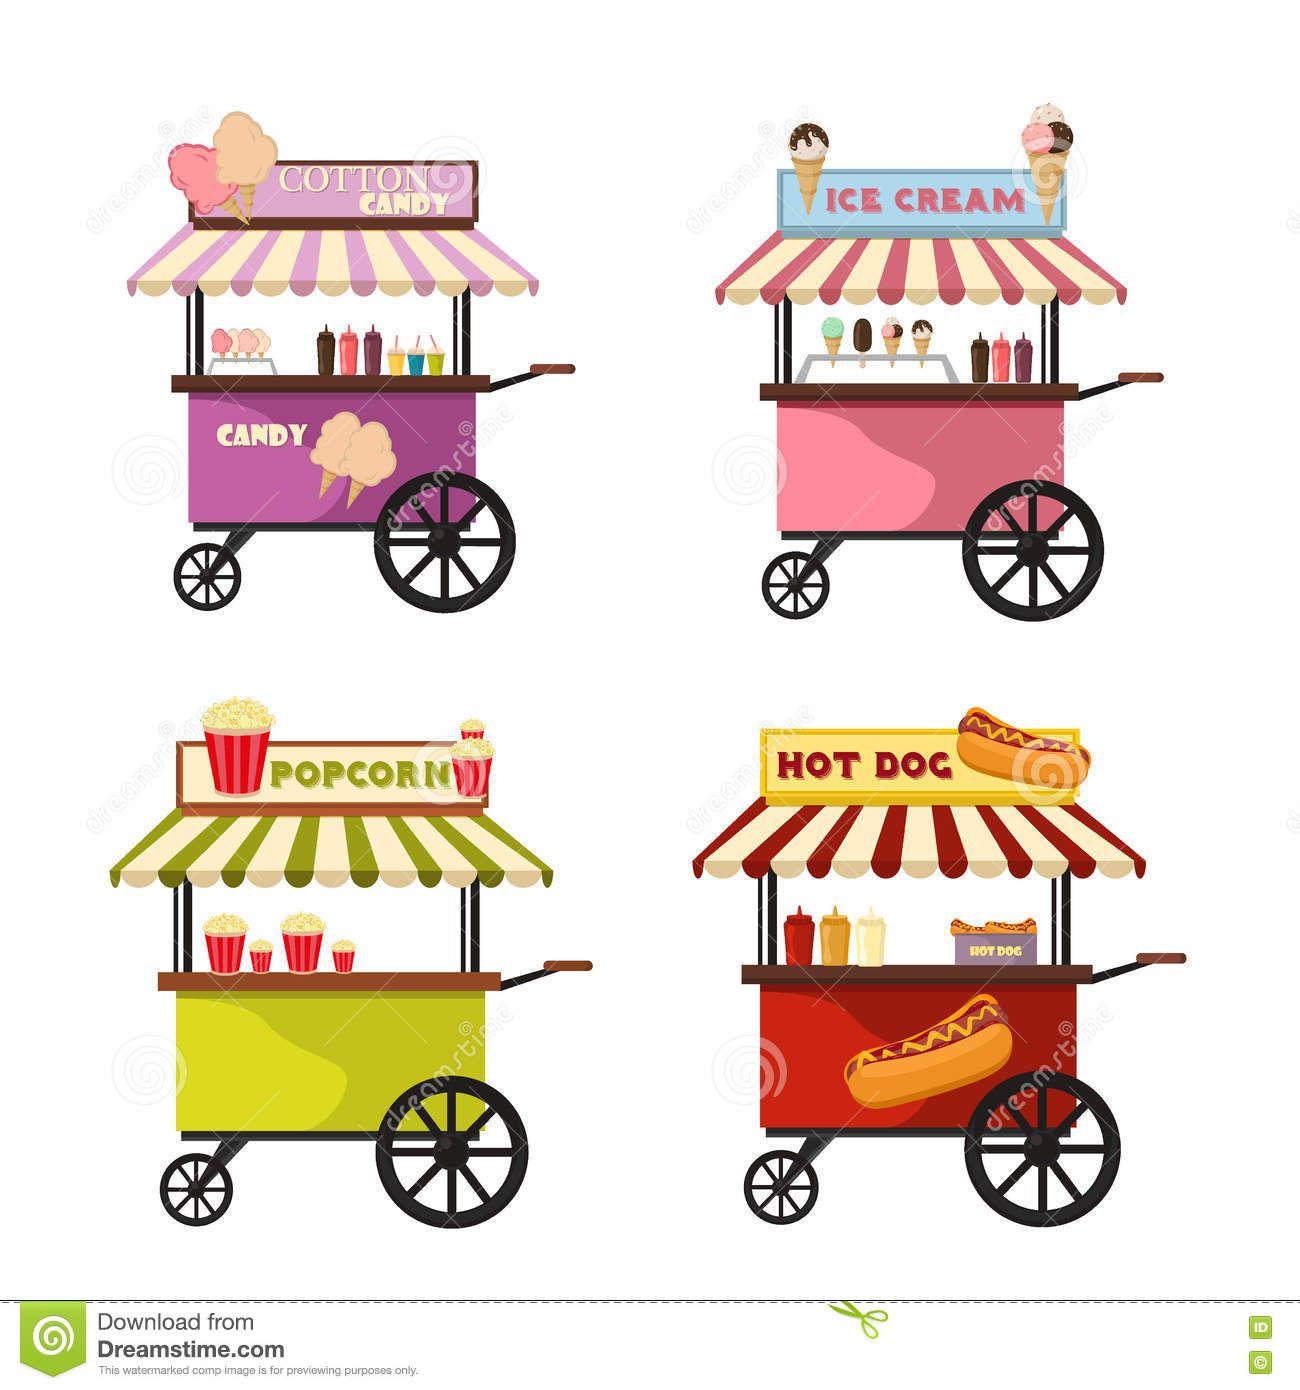 Https Thumbs Dreamstime Com Z Vector Illustration Food Truck Icon Designs Cartoon Trucks Delivery Street Van Fast De Icon Design Truck Icon Food Truck Design